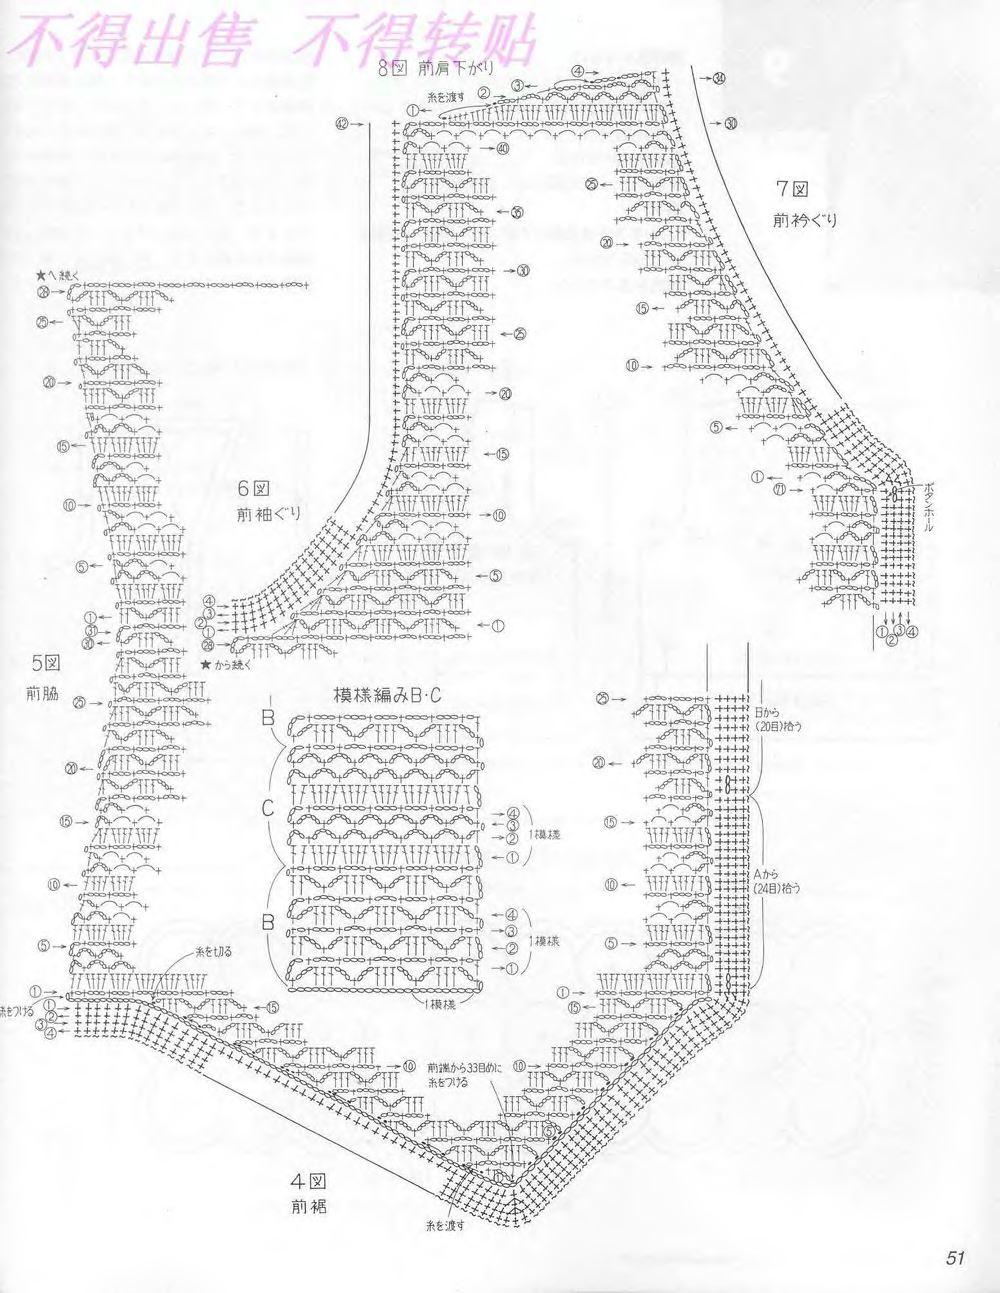 0359_Let's knit series 10 kr_11 (4)